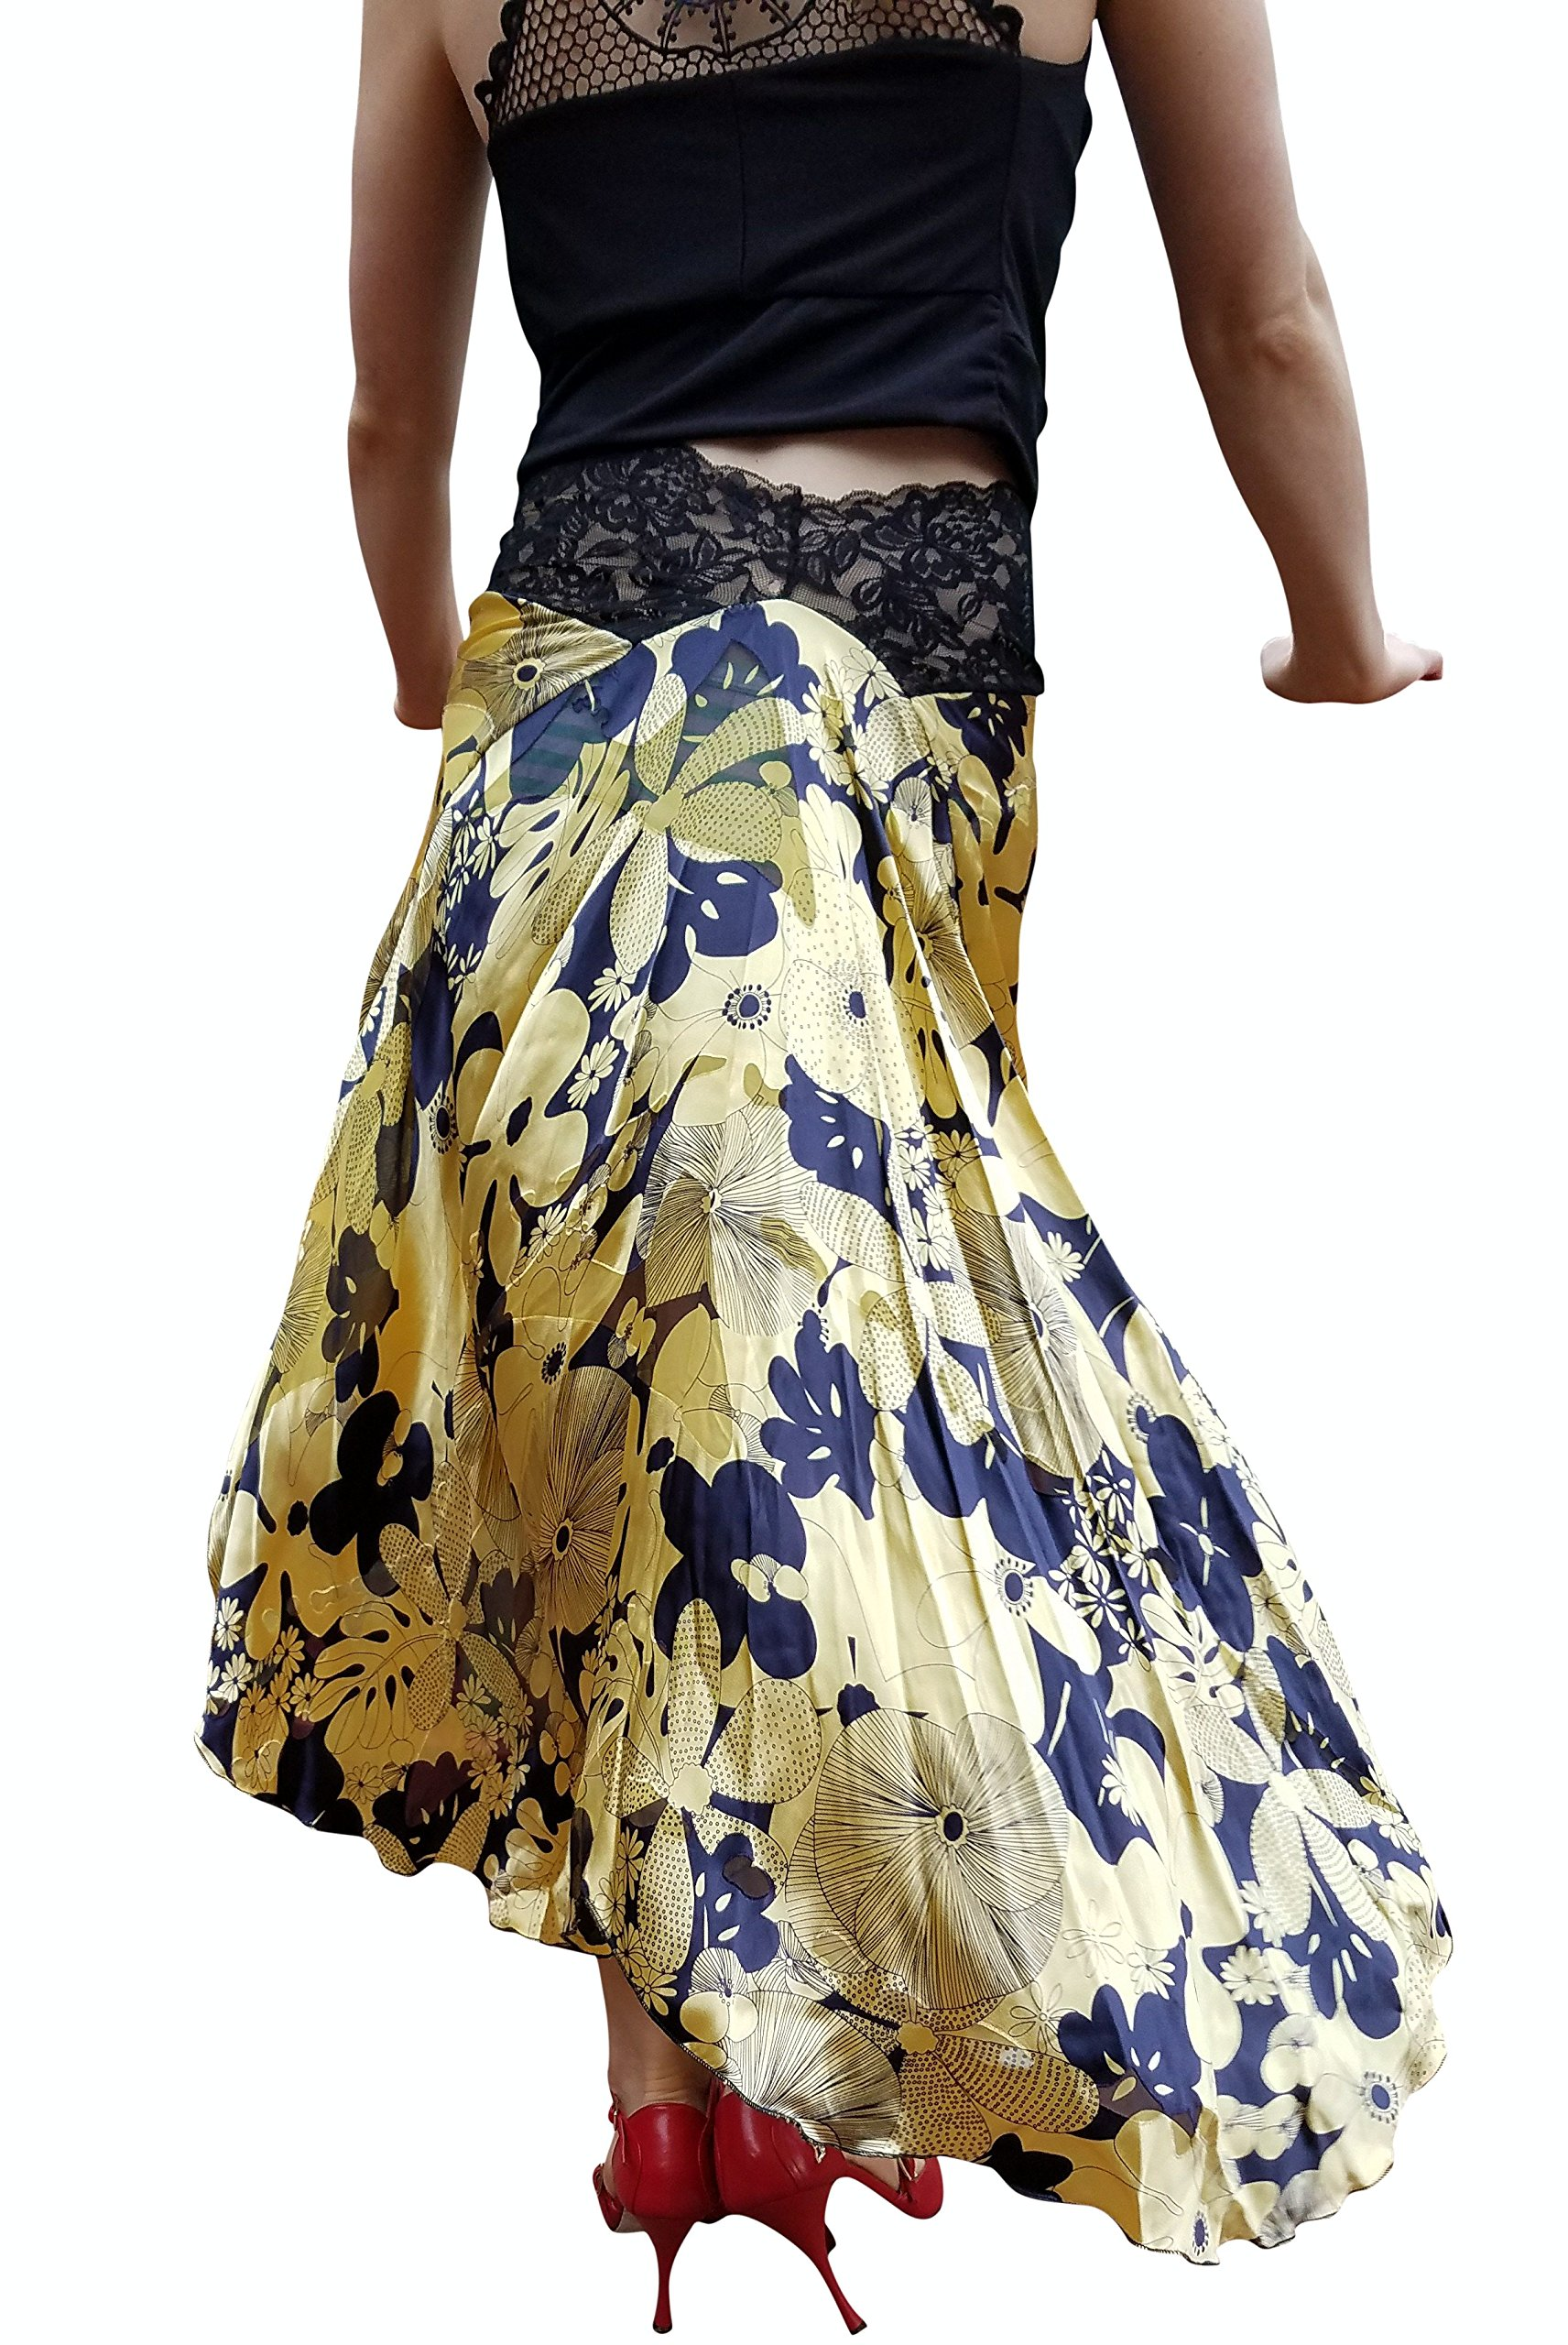 tango skirt Argentine tango silk